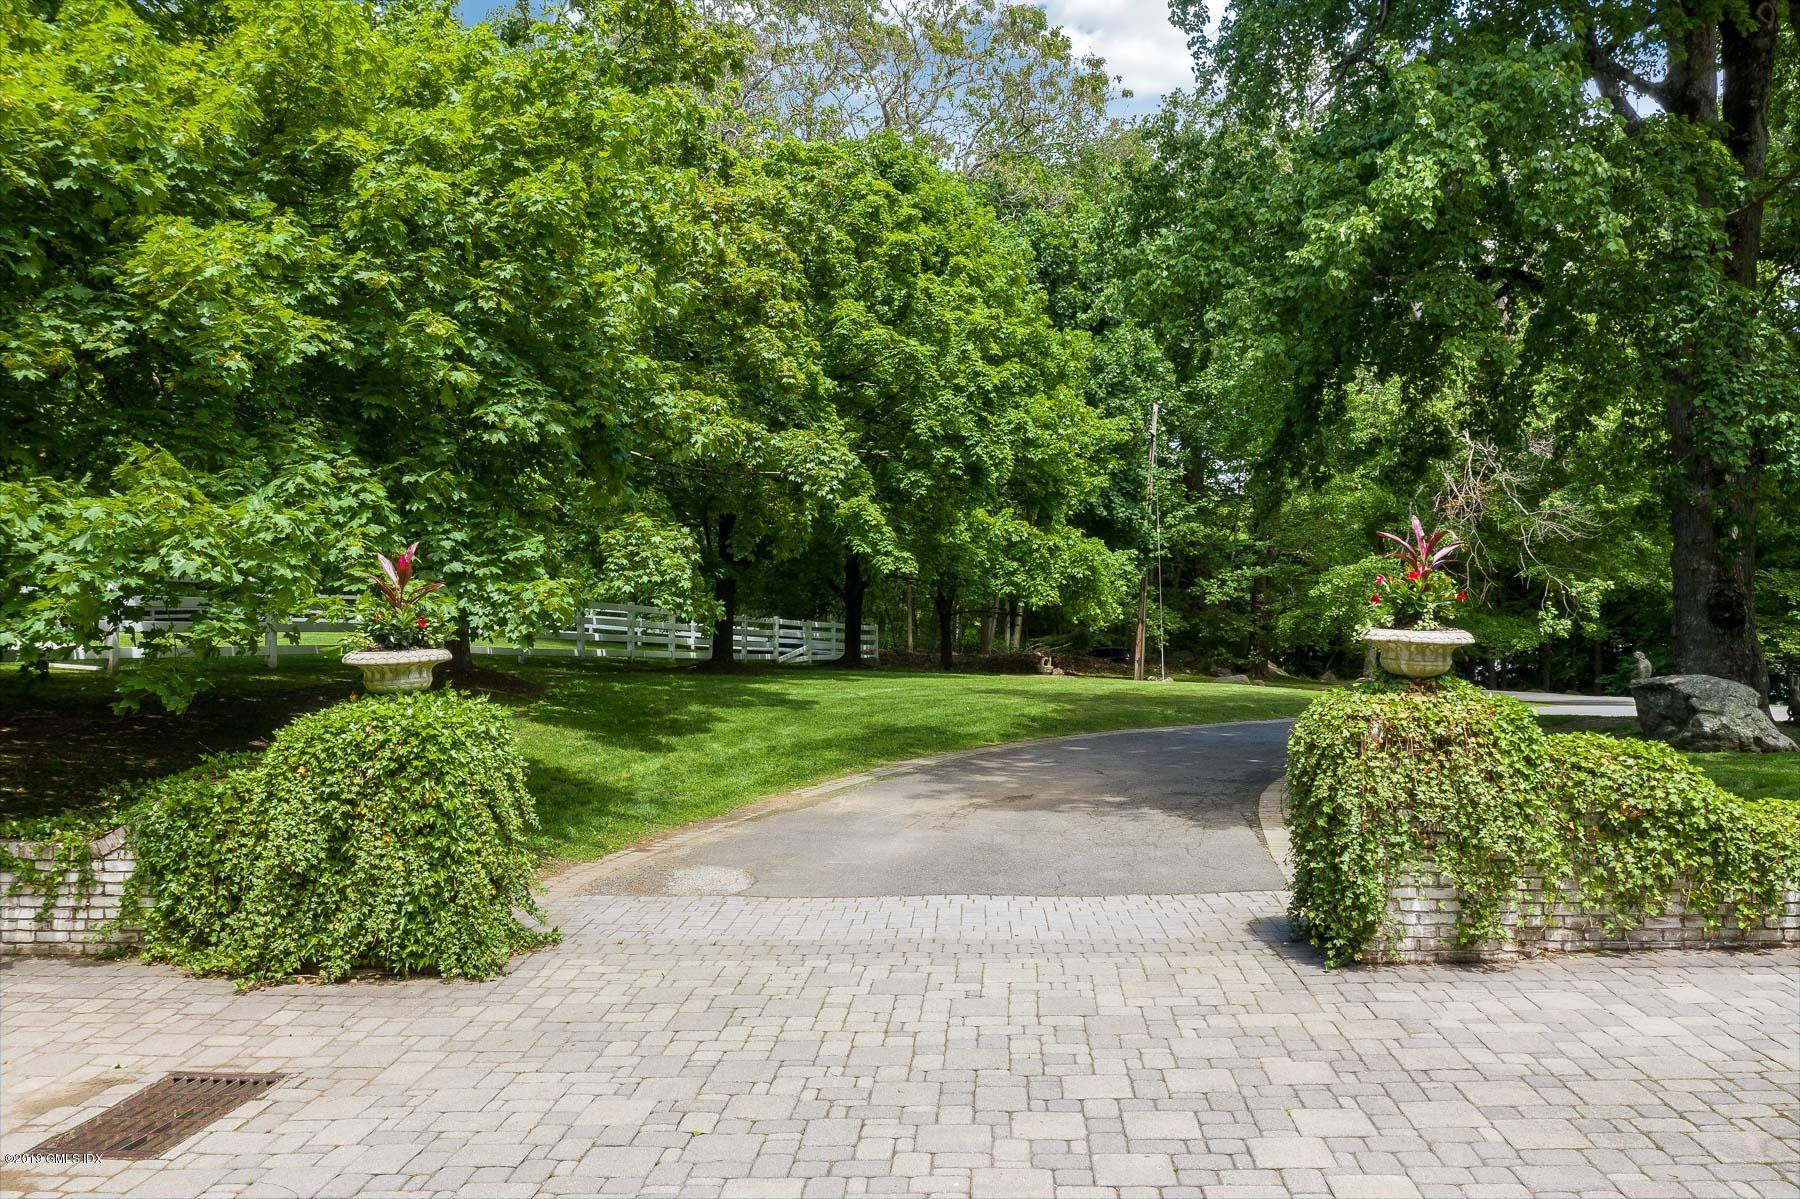 44 Porchuck Road,Greenwich,Connecticut 06831,6 Bedrooms Bedrooms,6 BathroomsBathrooms,Single family,Porchuck,107266